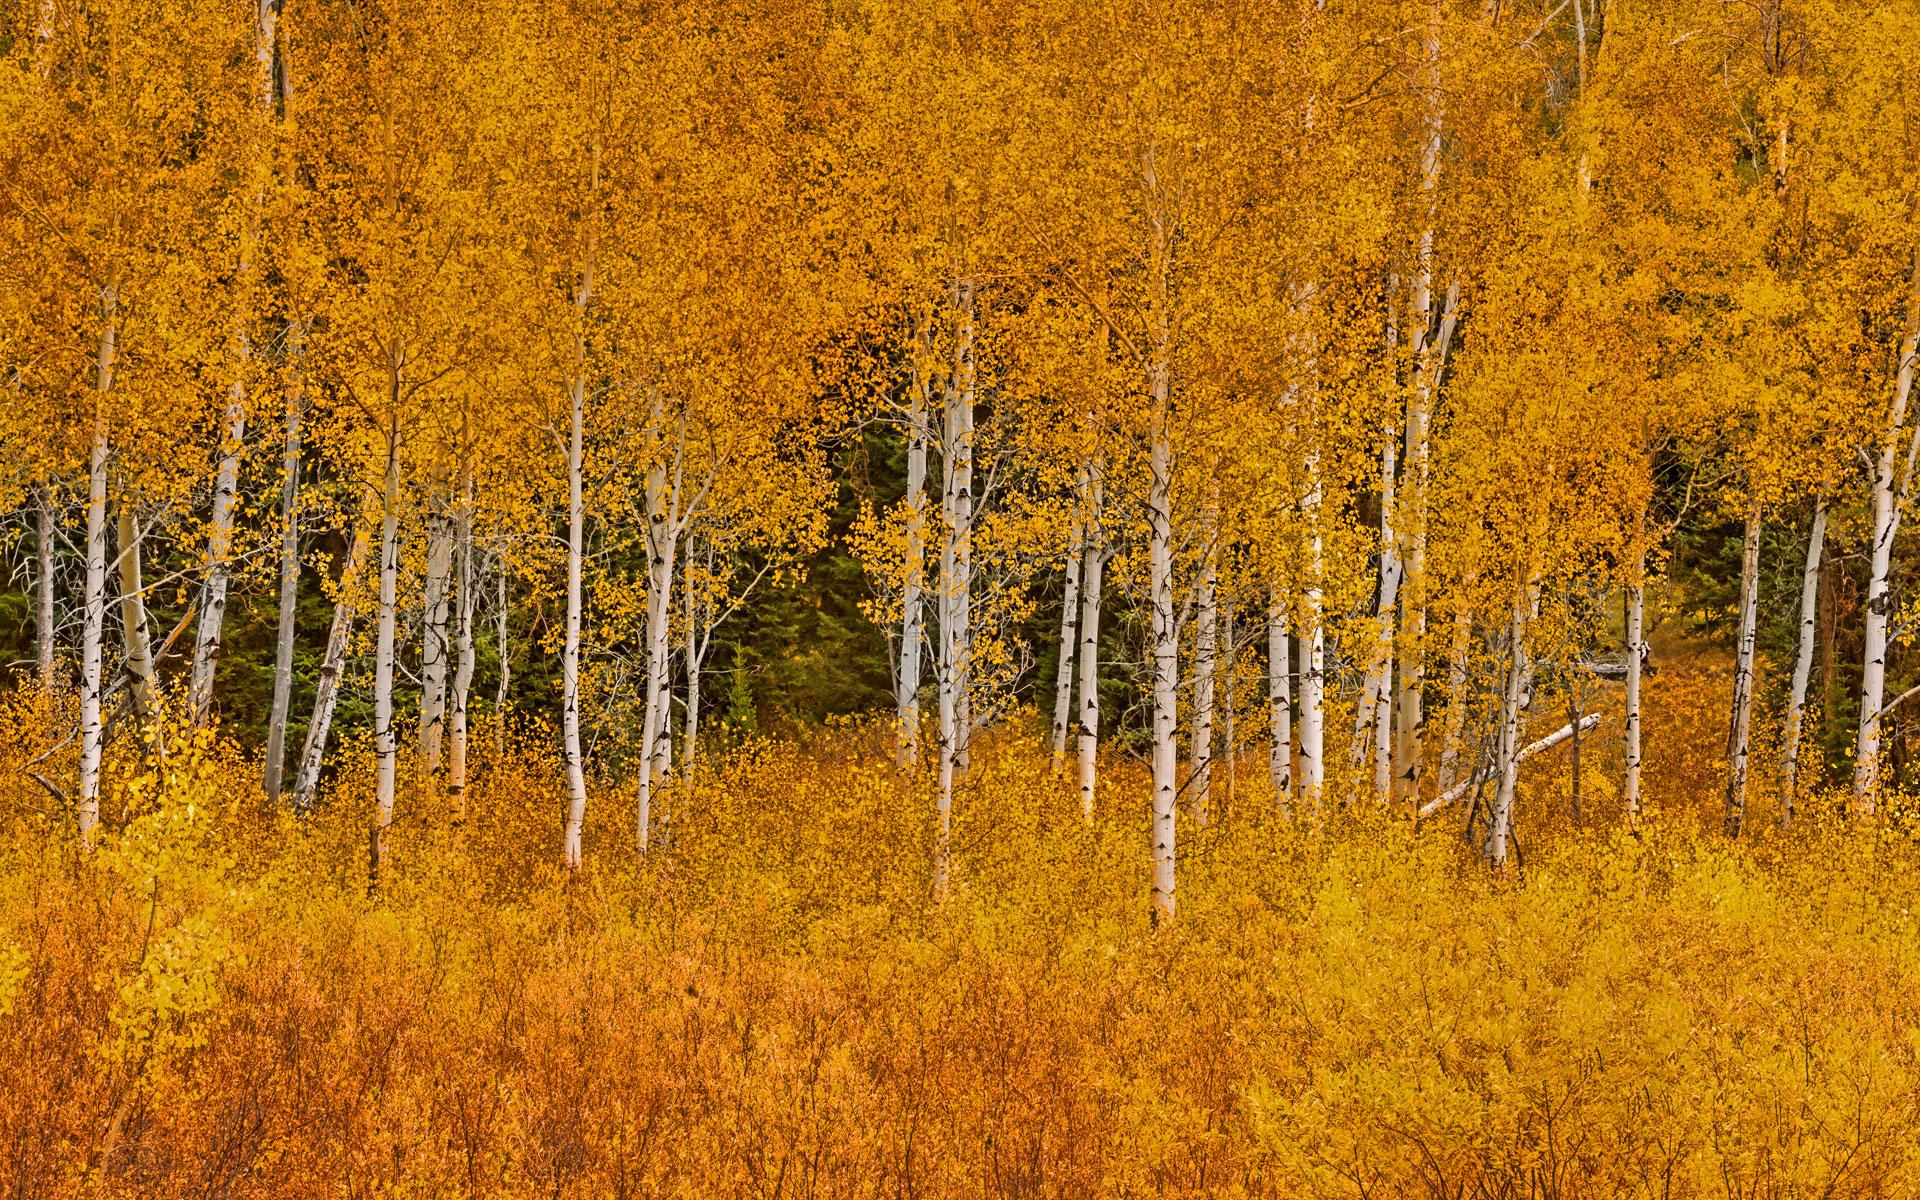 деревья парк осень роща  № 3186074 без смс